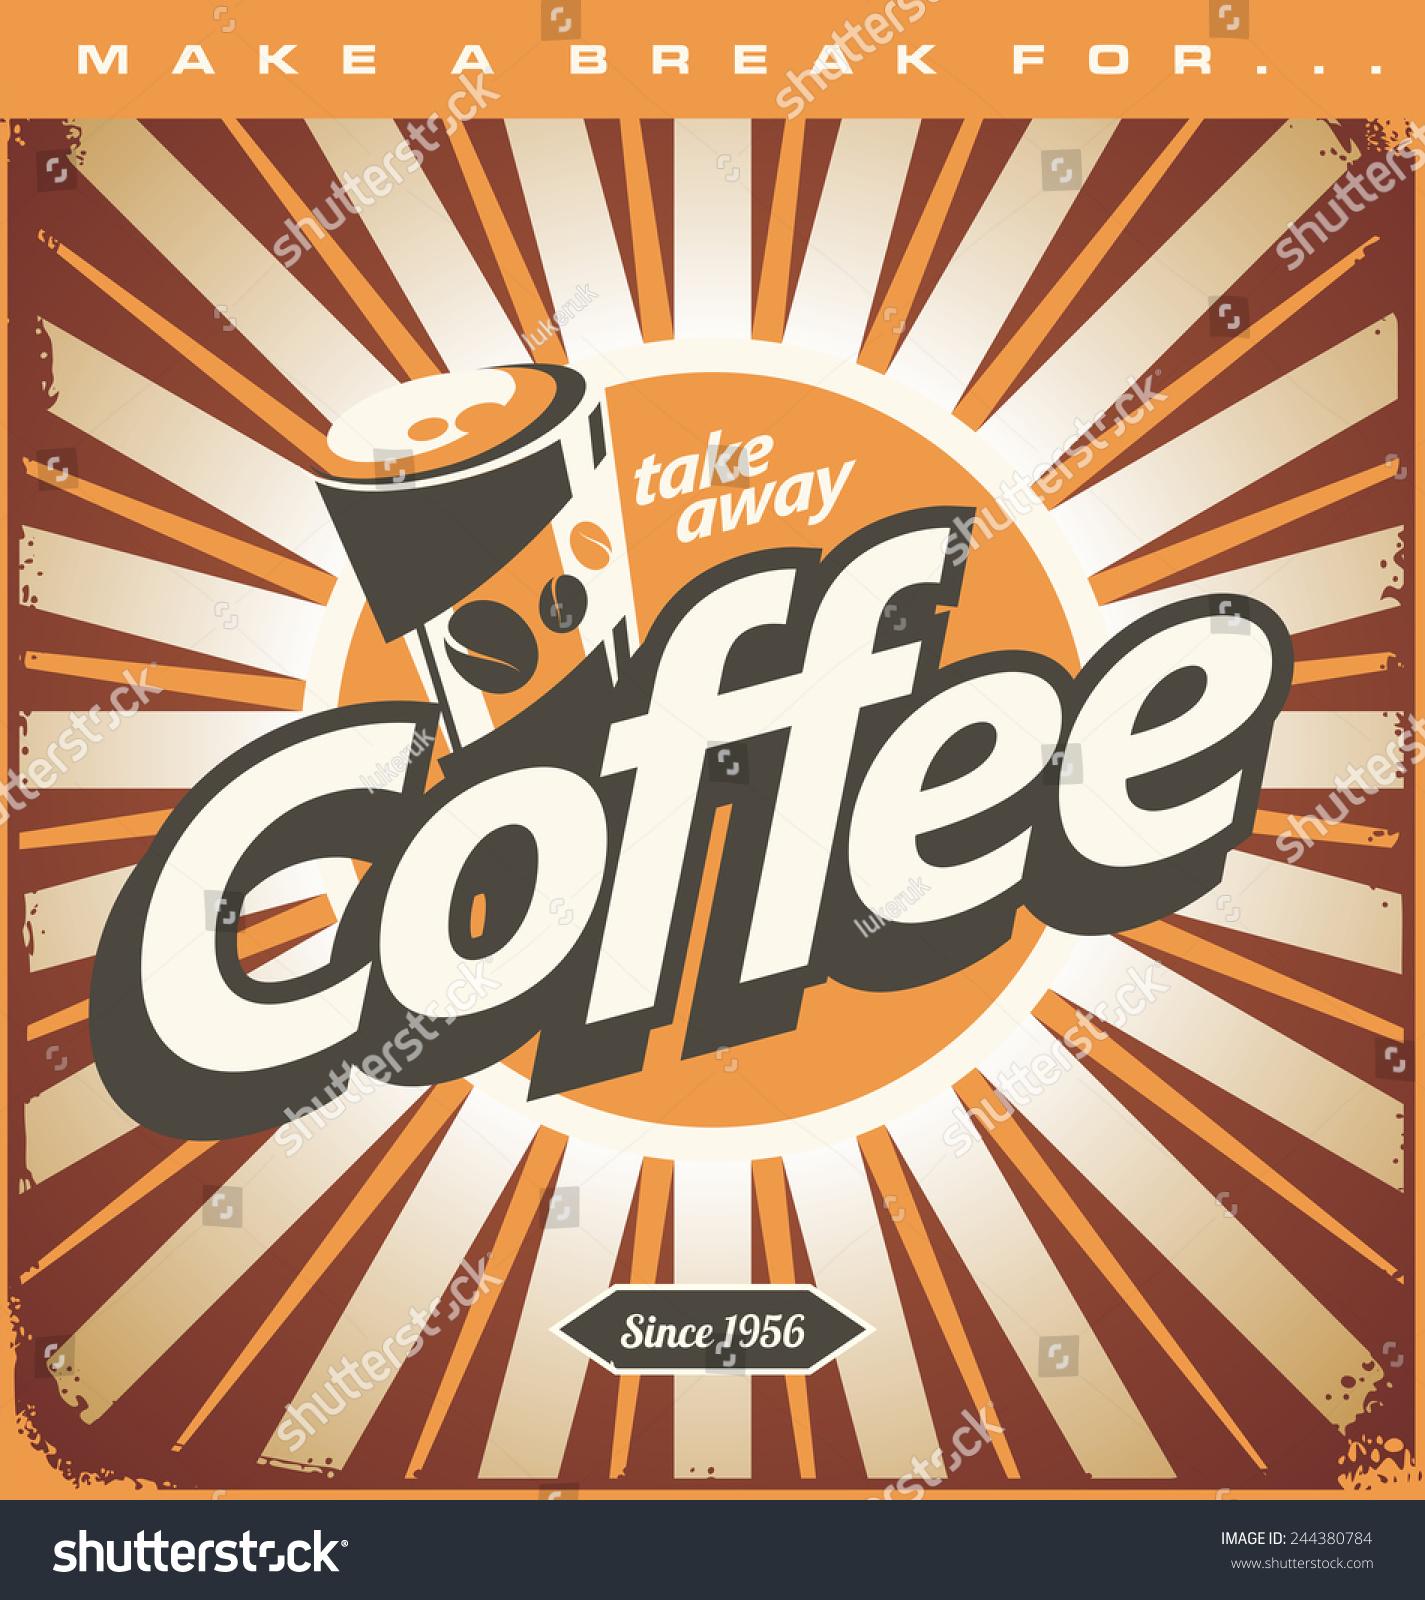 Make a poster design - Printable Design Poster Making Background Retro Coffee Shop Design Concept On Old Metal Background